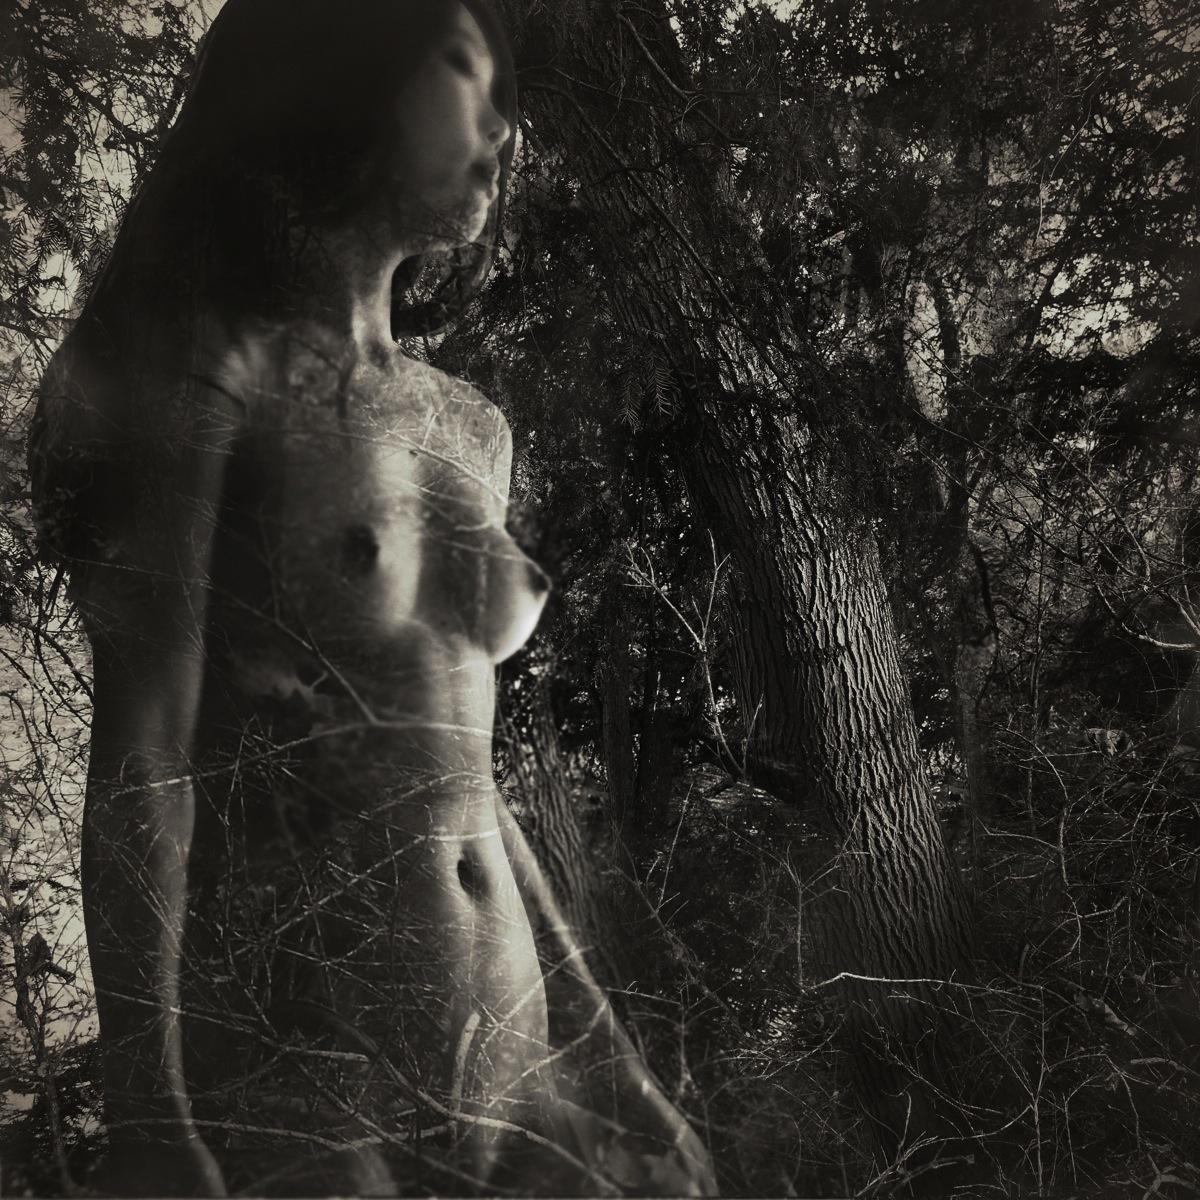 Pénétration des mondes- Femme forêt